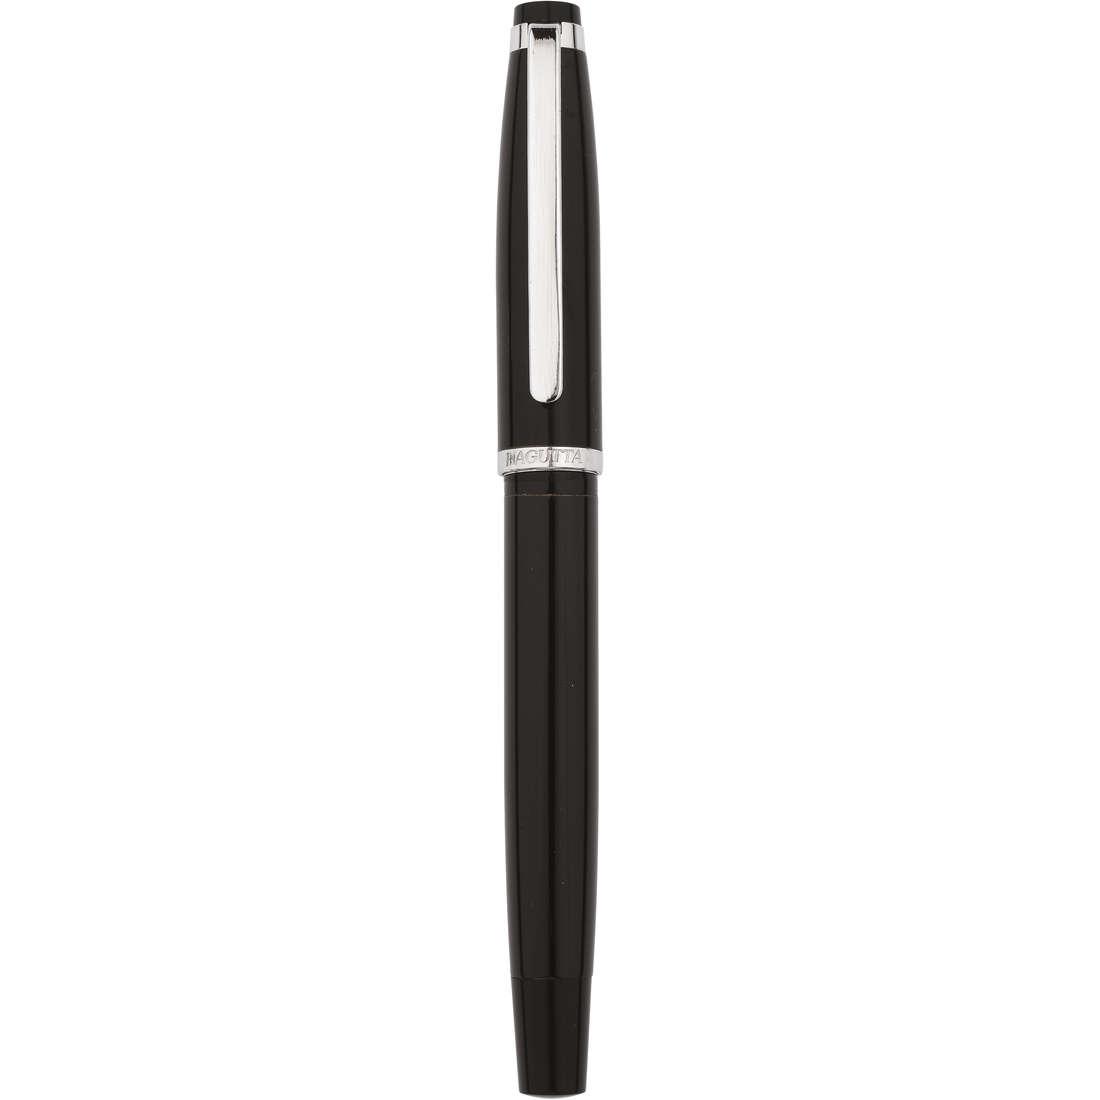 penna unisex gioielli Bagutta H 6000-02 R